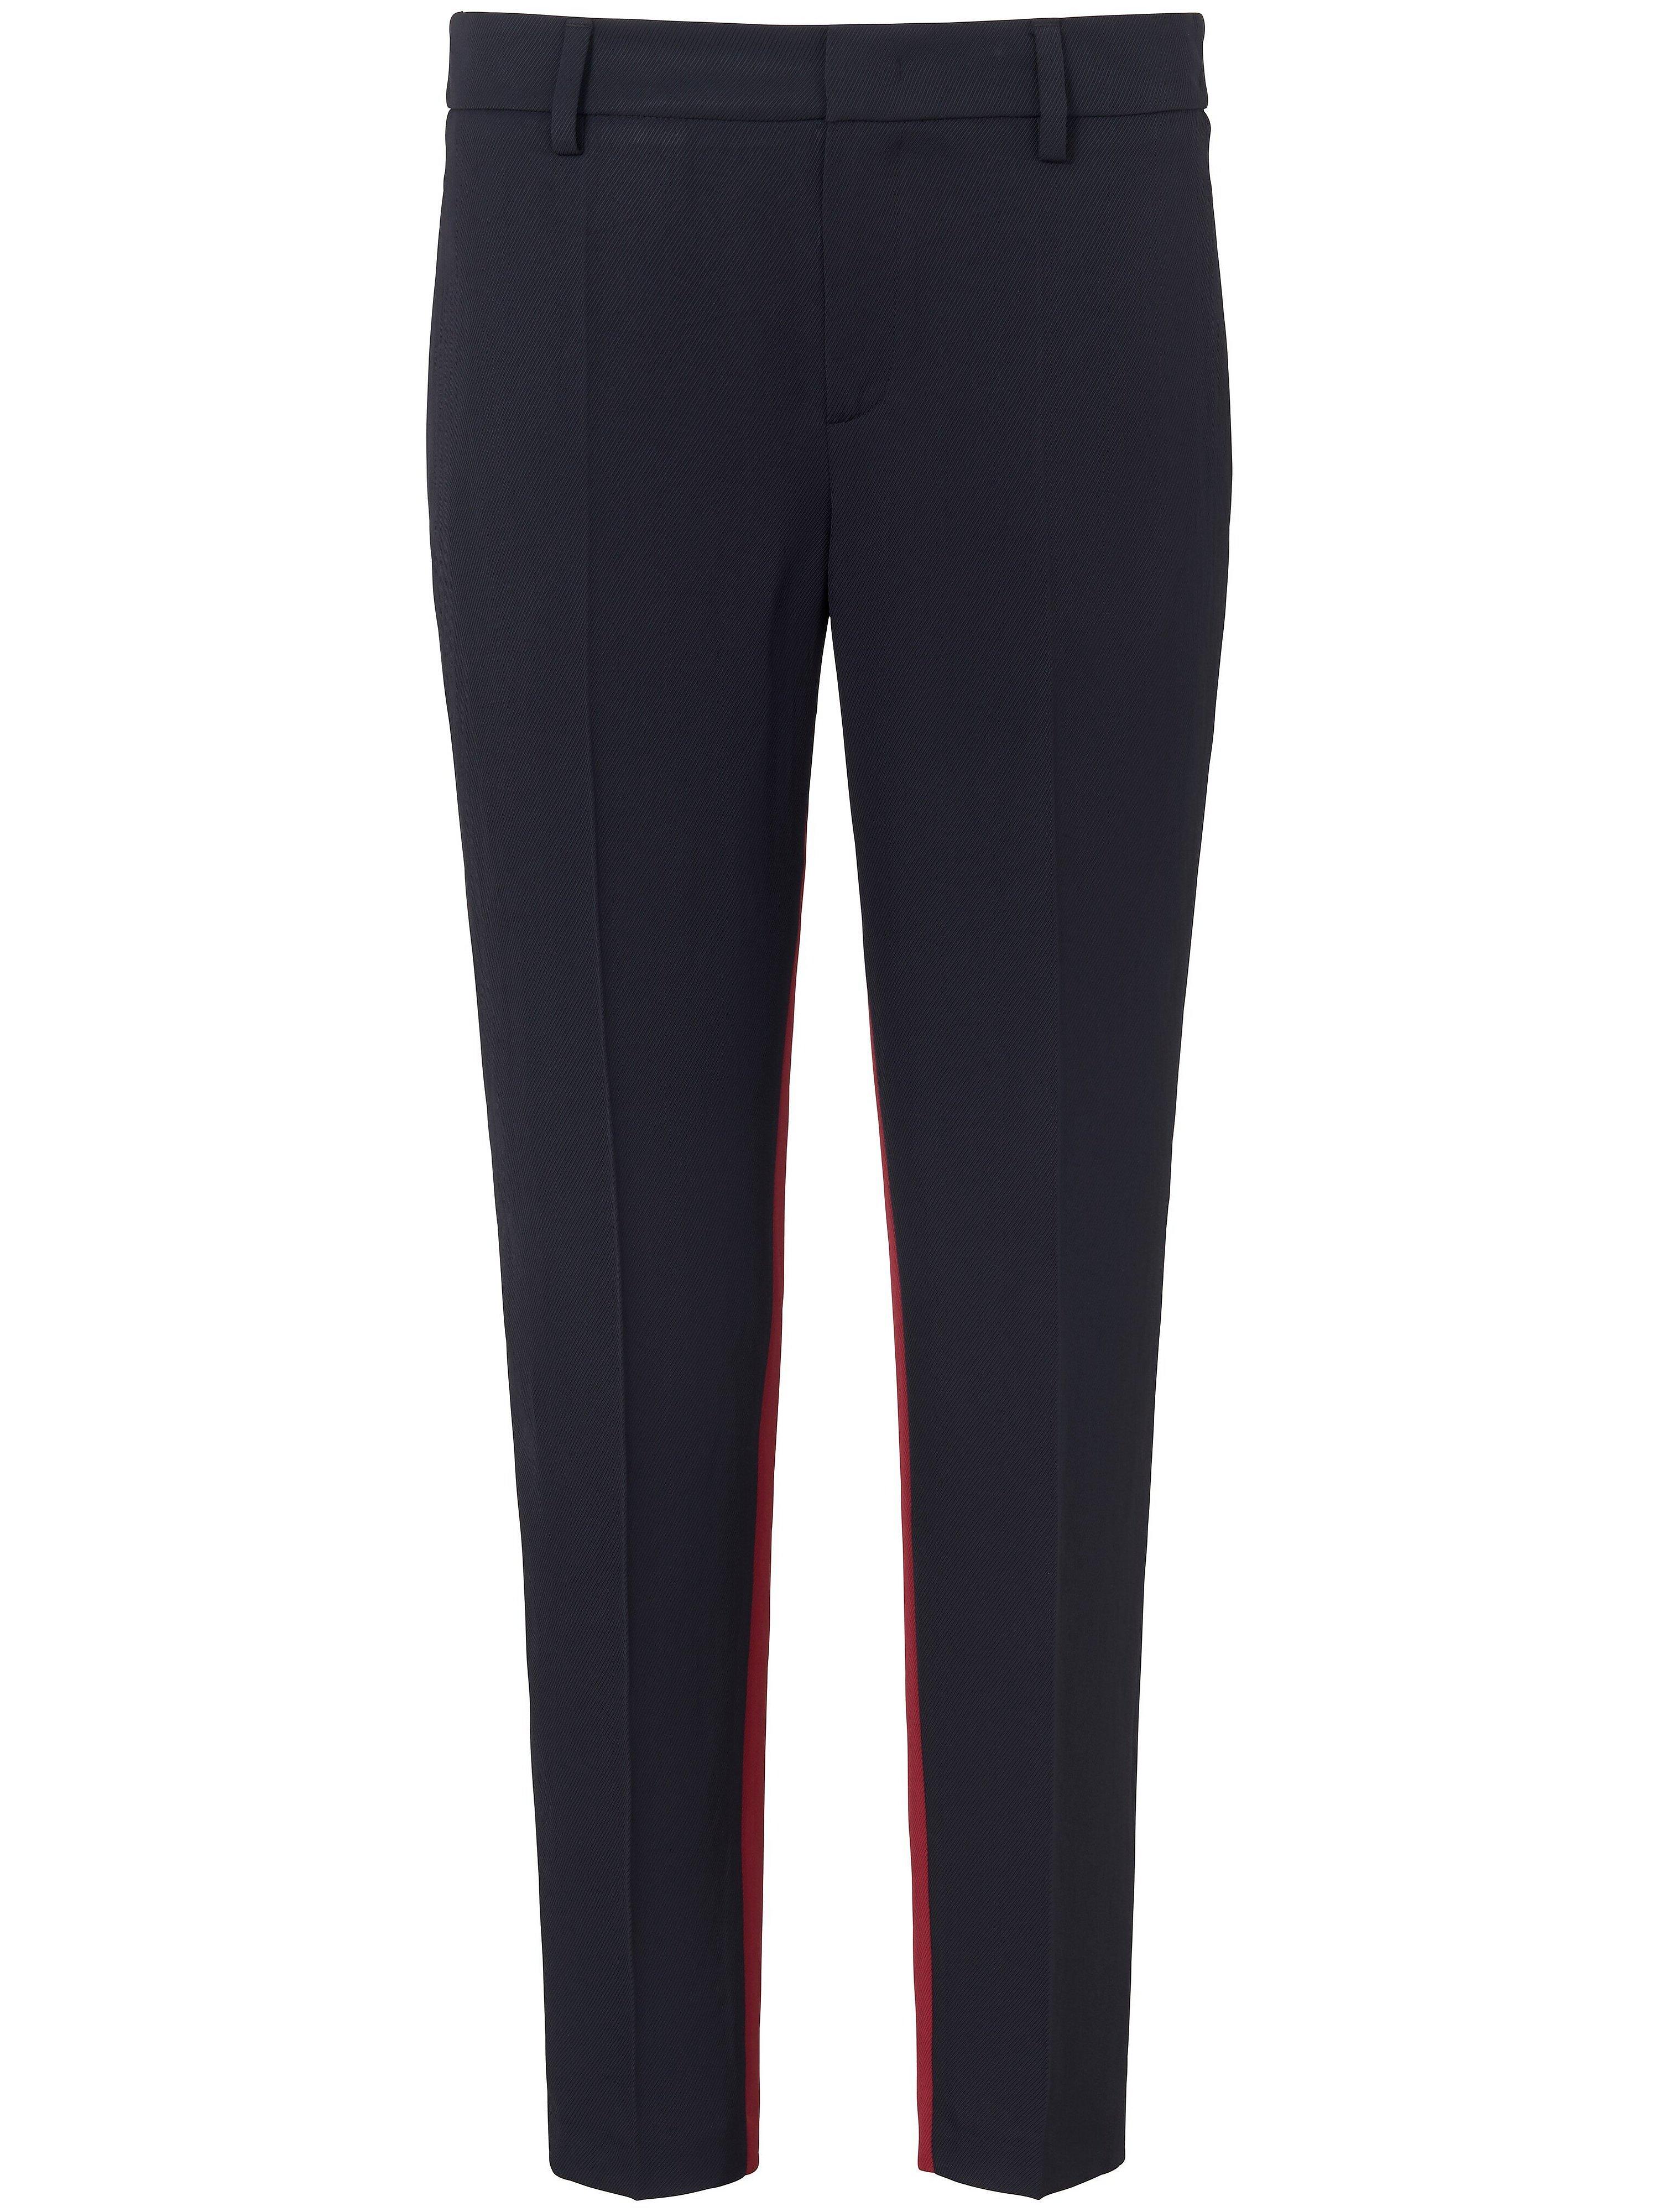 Le pantalon 7/8  Strenesse multicolore taille 38